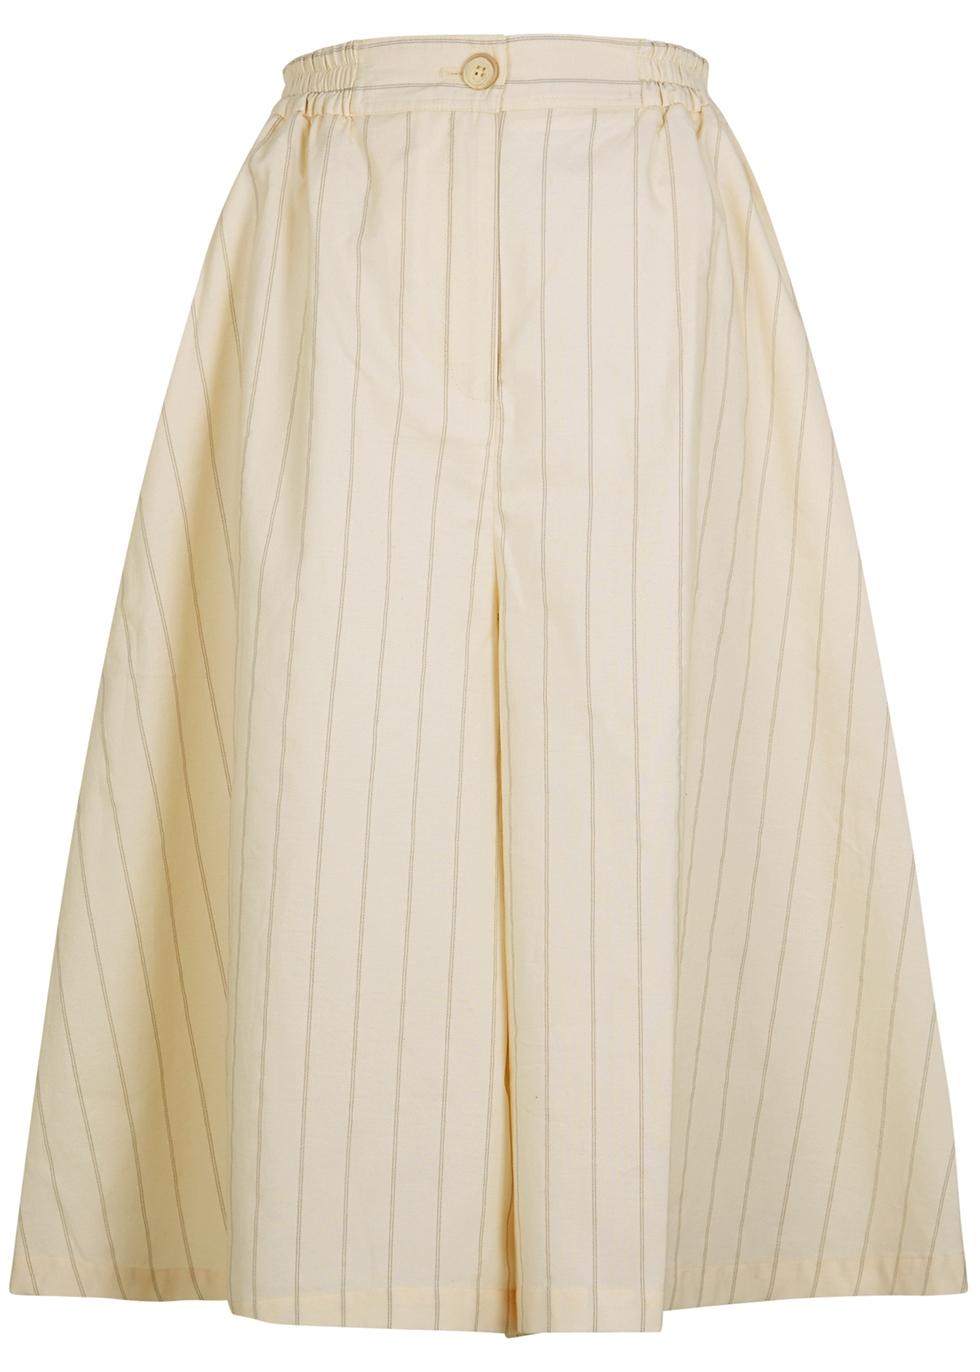 Phraya cream cotton-blend culottes